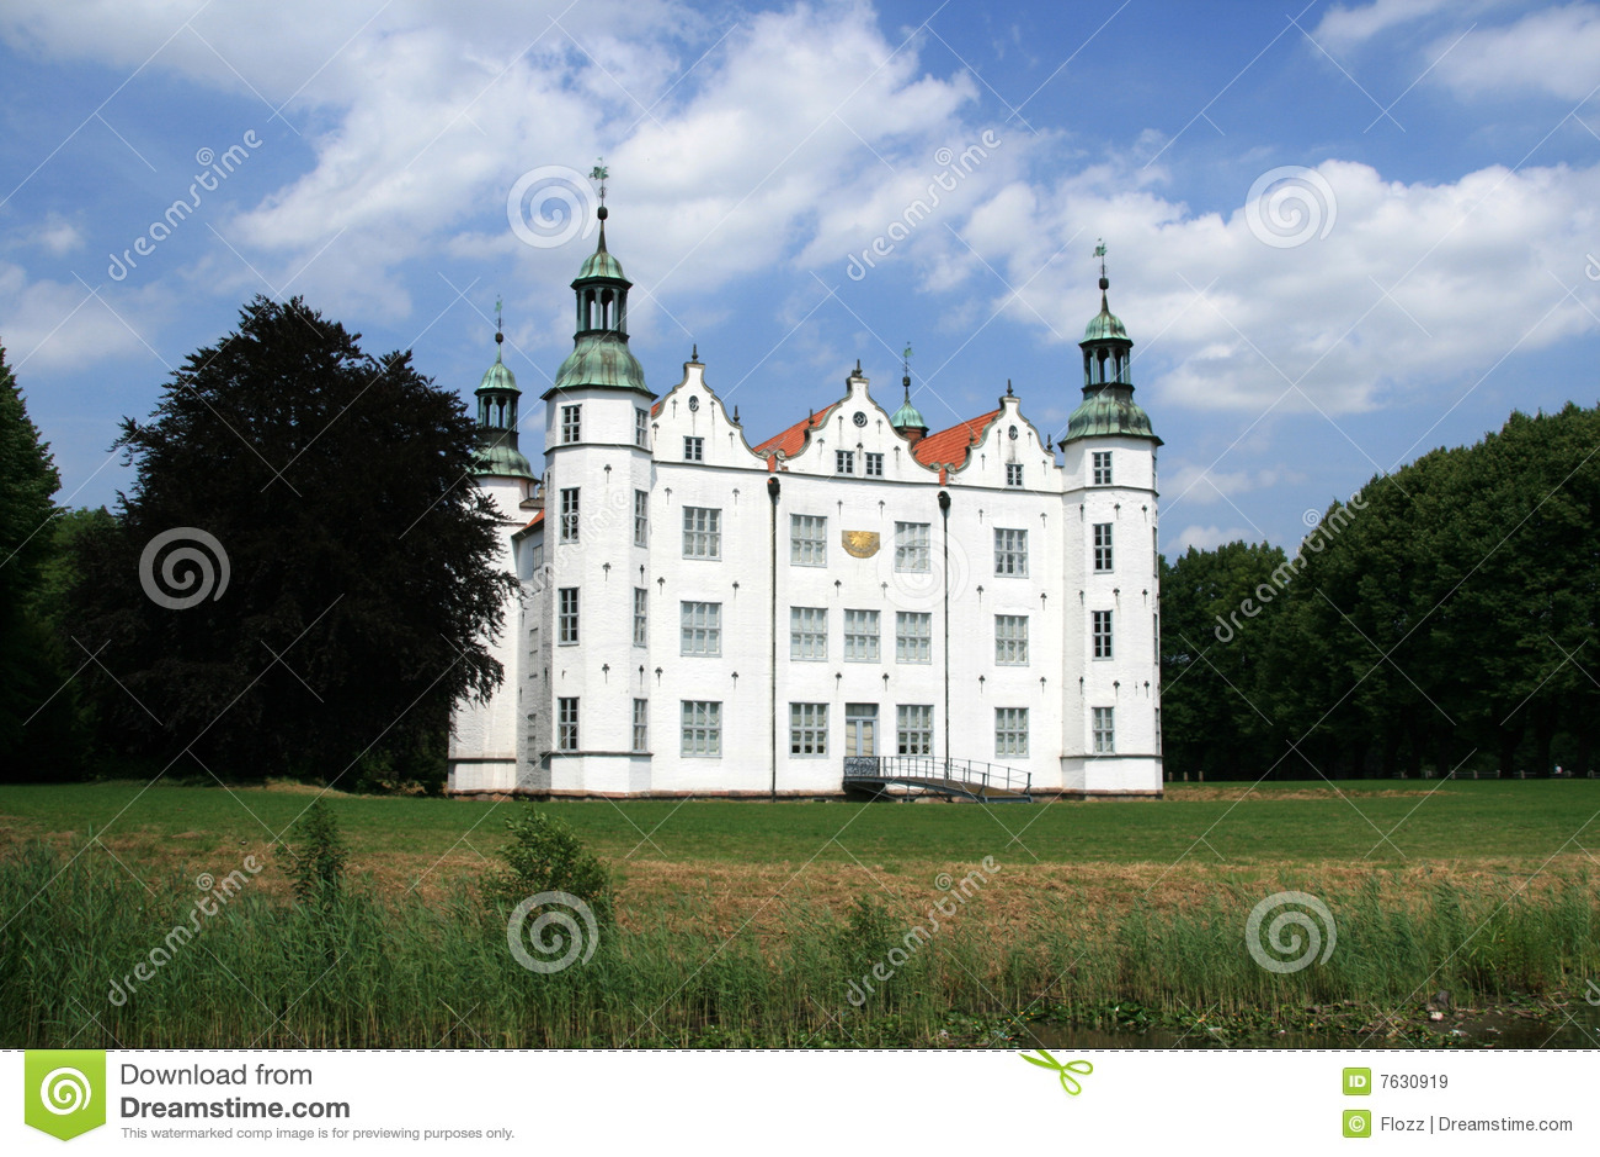 castle ahrensburg stock image